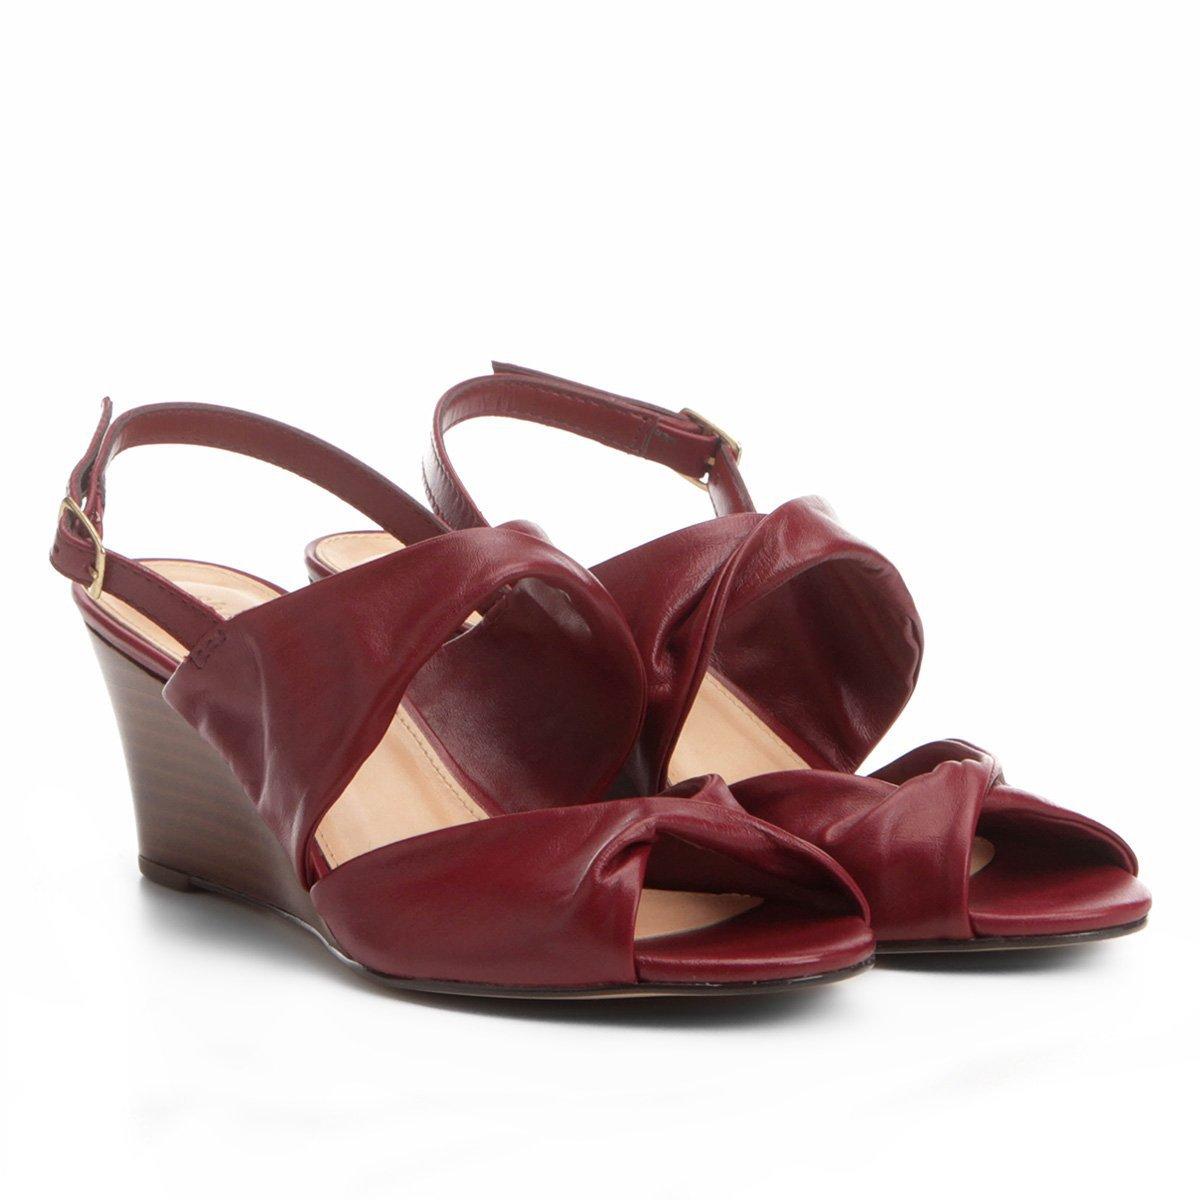 6de7bf024f Sandália Anabela Couro Shoestock Drapeado Feminina